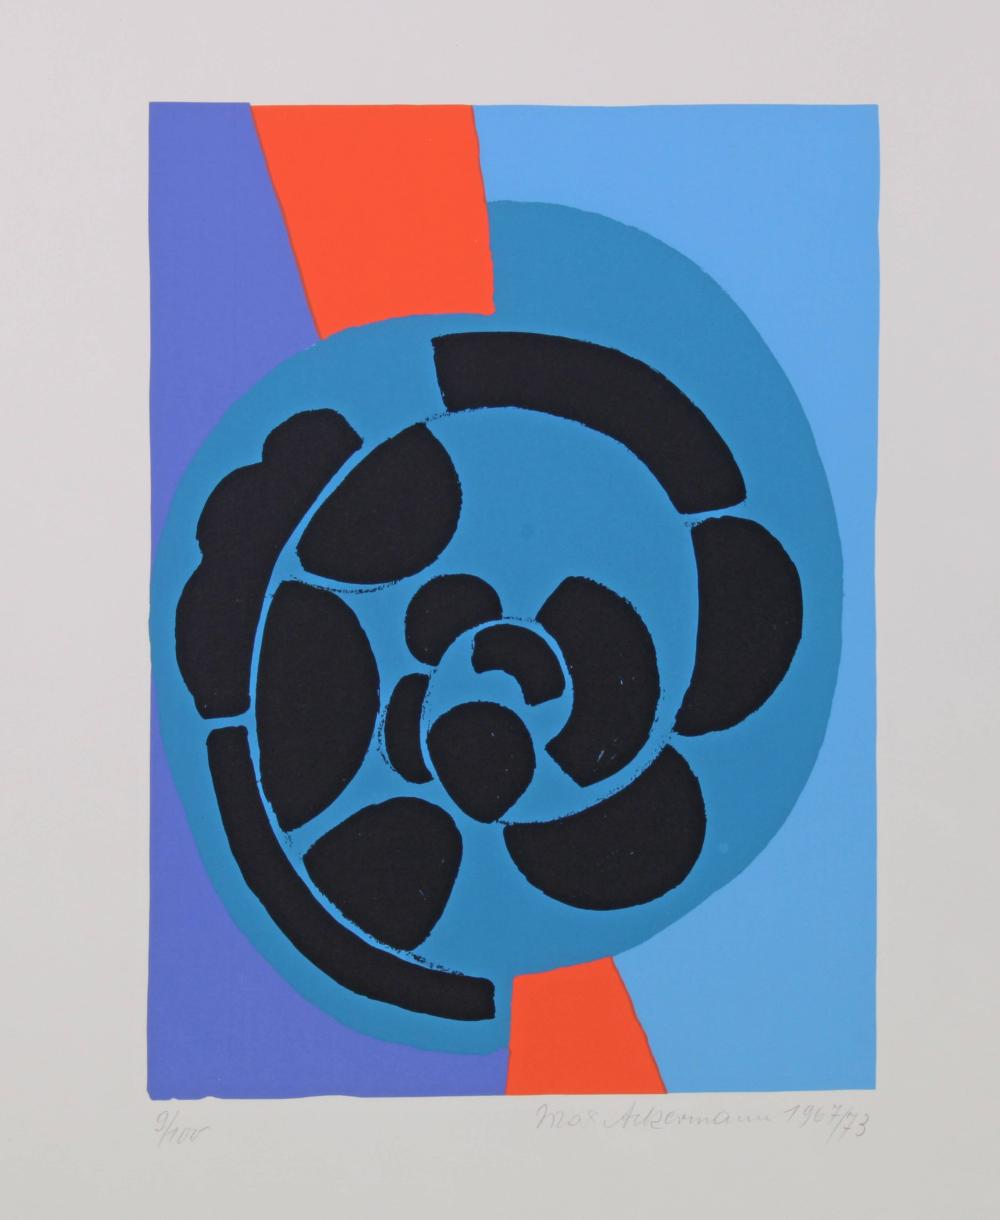 Ackermann, Max (Berlin 1887 - 1975 Stuttgart, Studium an der Kunstschule in Weimar bei Henry van den Velde, an der KA Dresden, München und Stuttgart bei Adolf Hölzel, Maler und Grafiker),